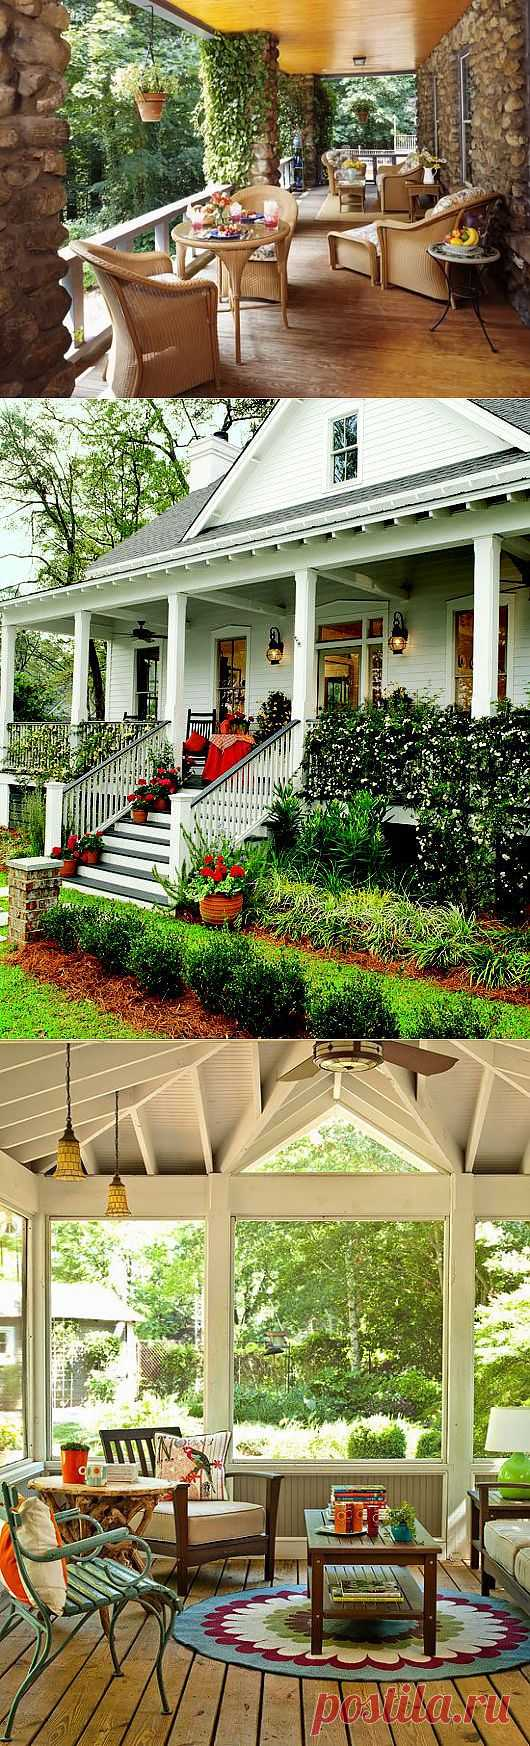 Дизайн интерьера крыльца дома.